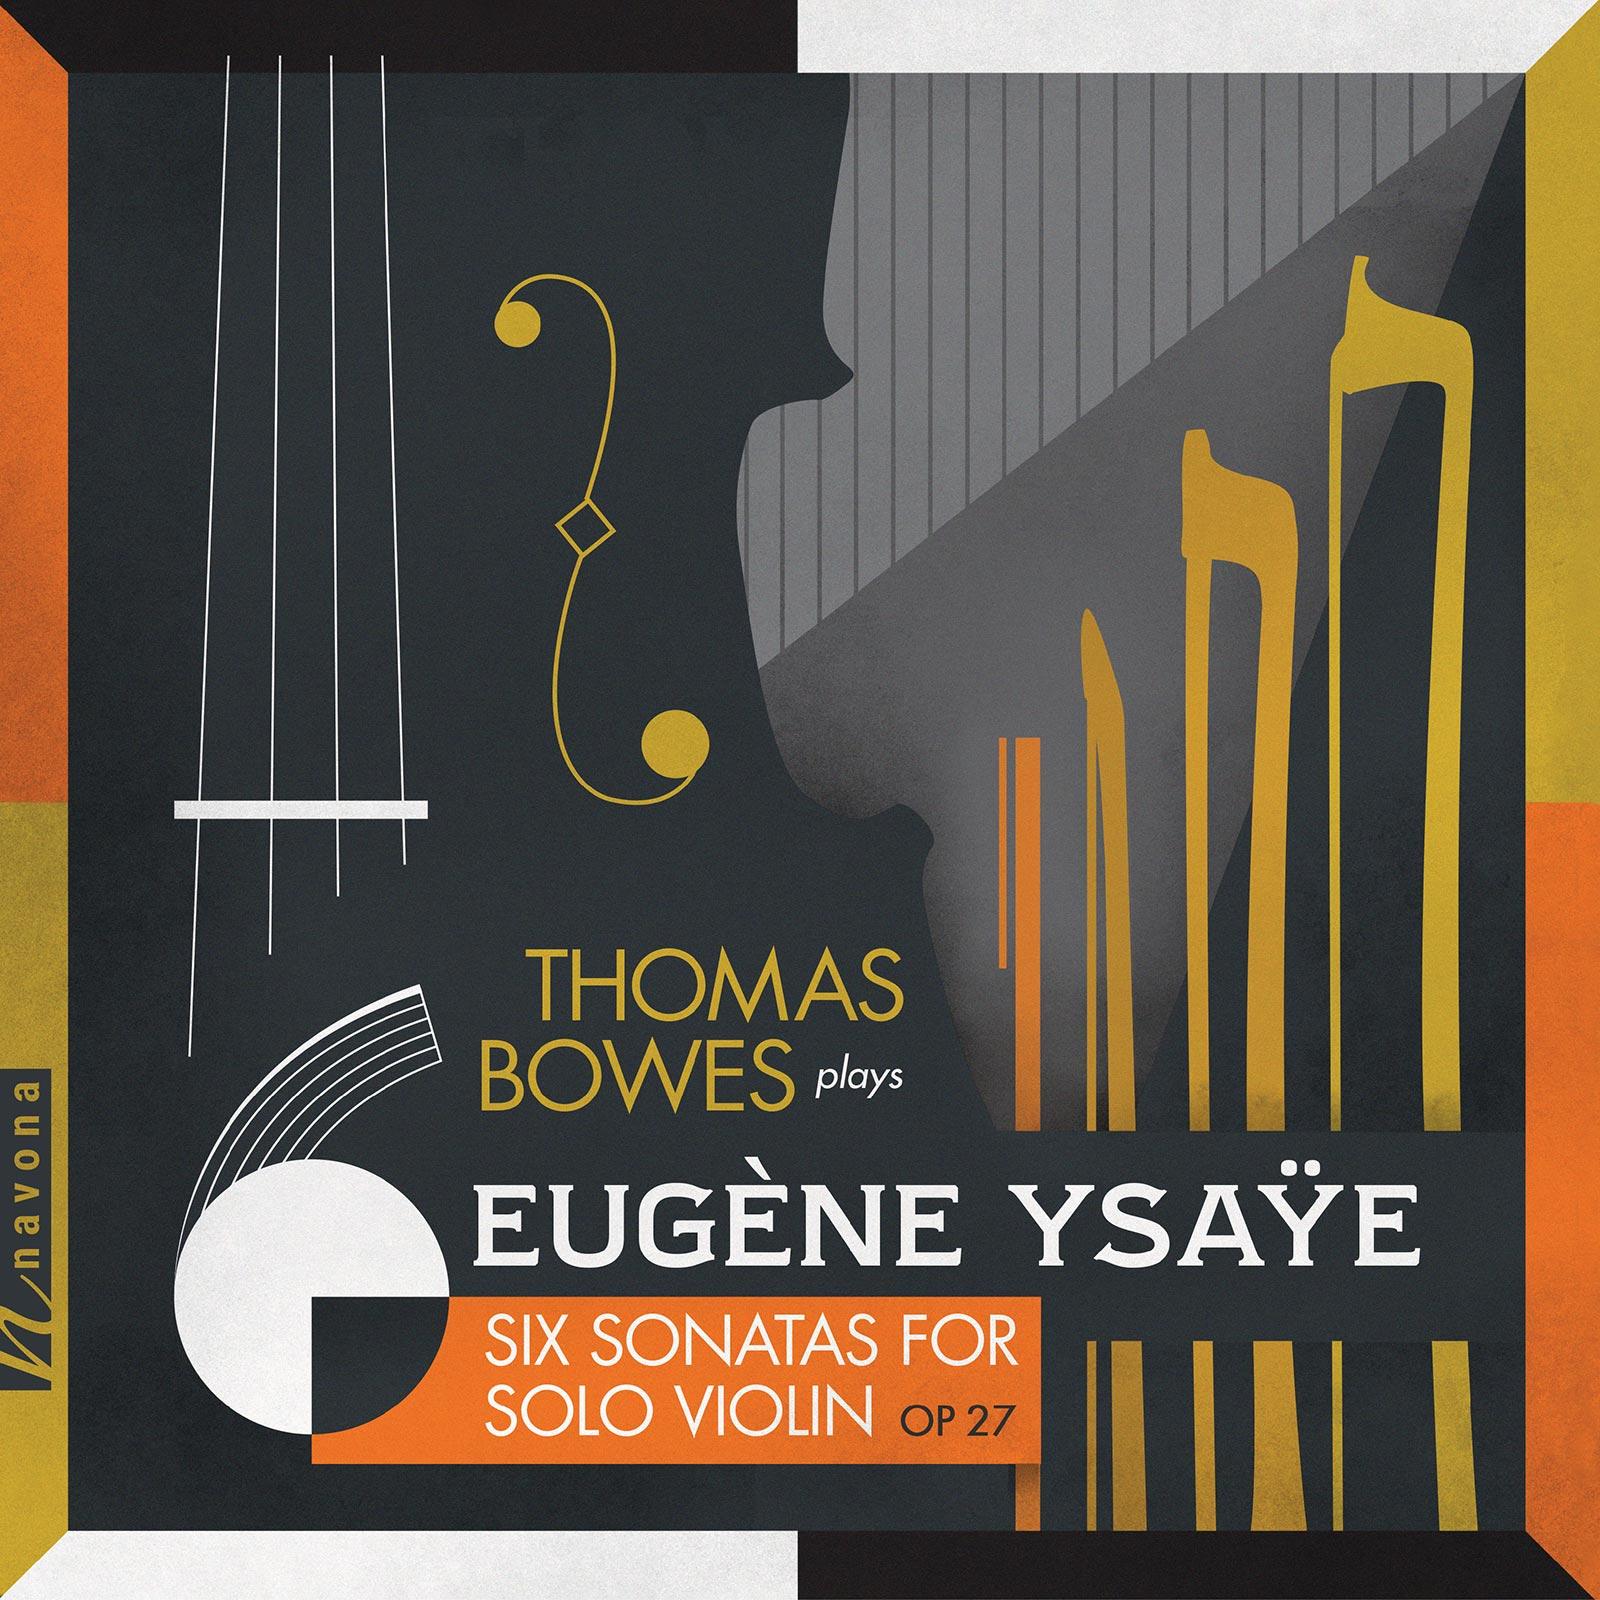 Six Sonatas for Solo Violin